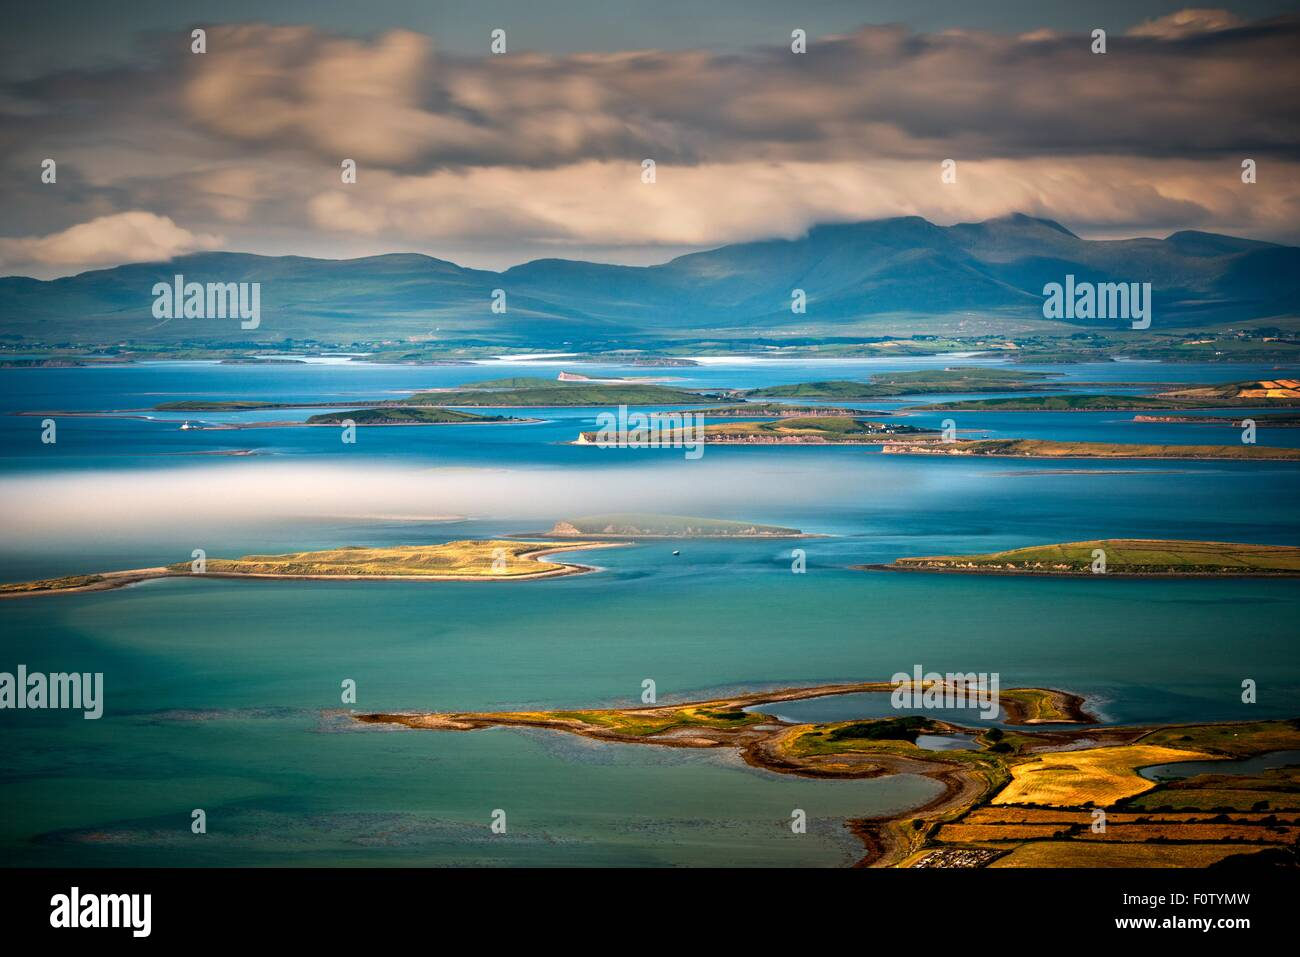 Clew Bay, Westport, County Mayo, Ireland - Stock Image